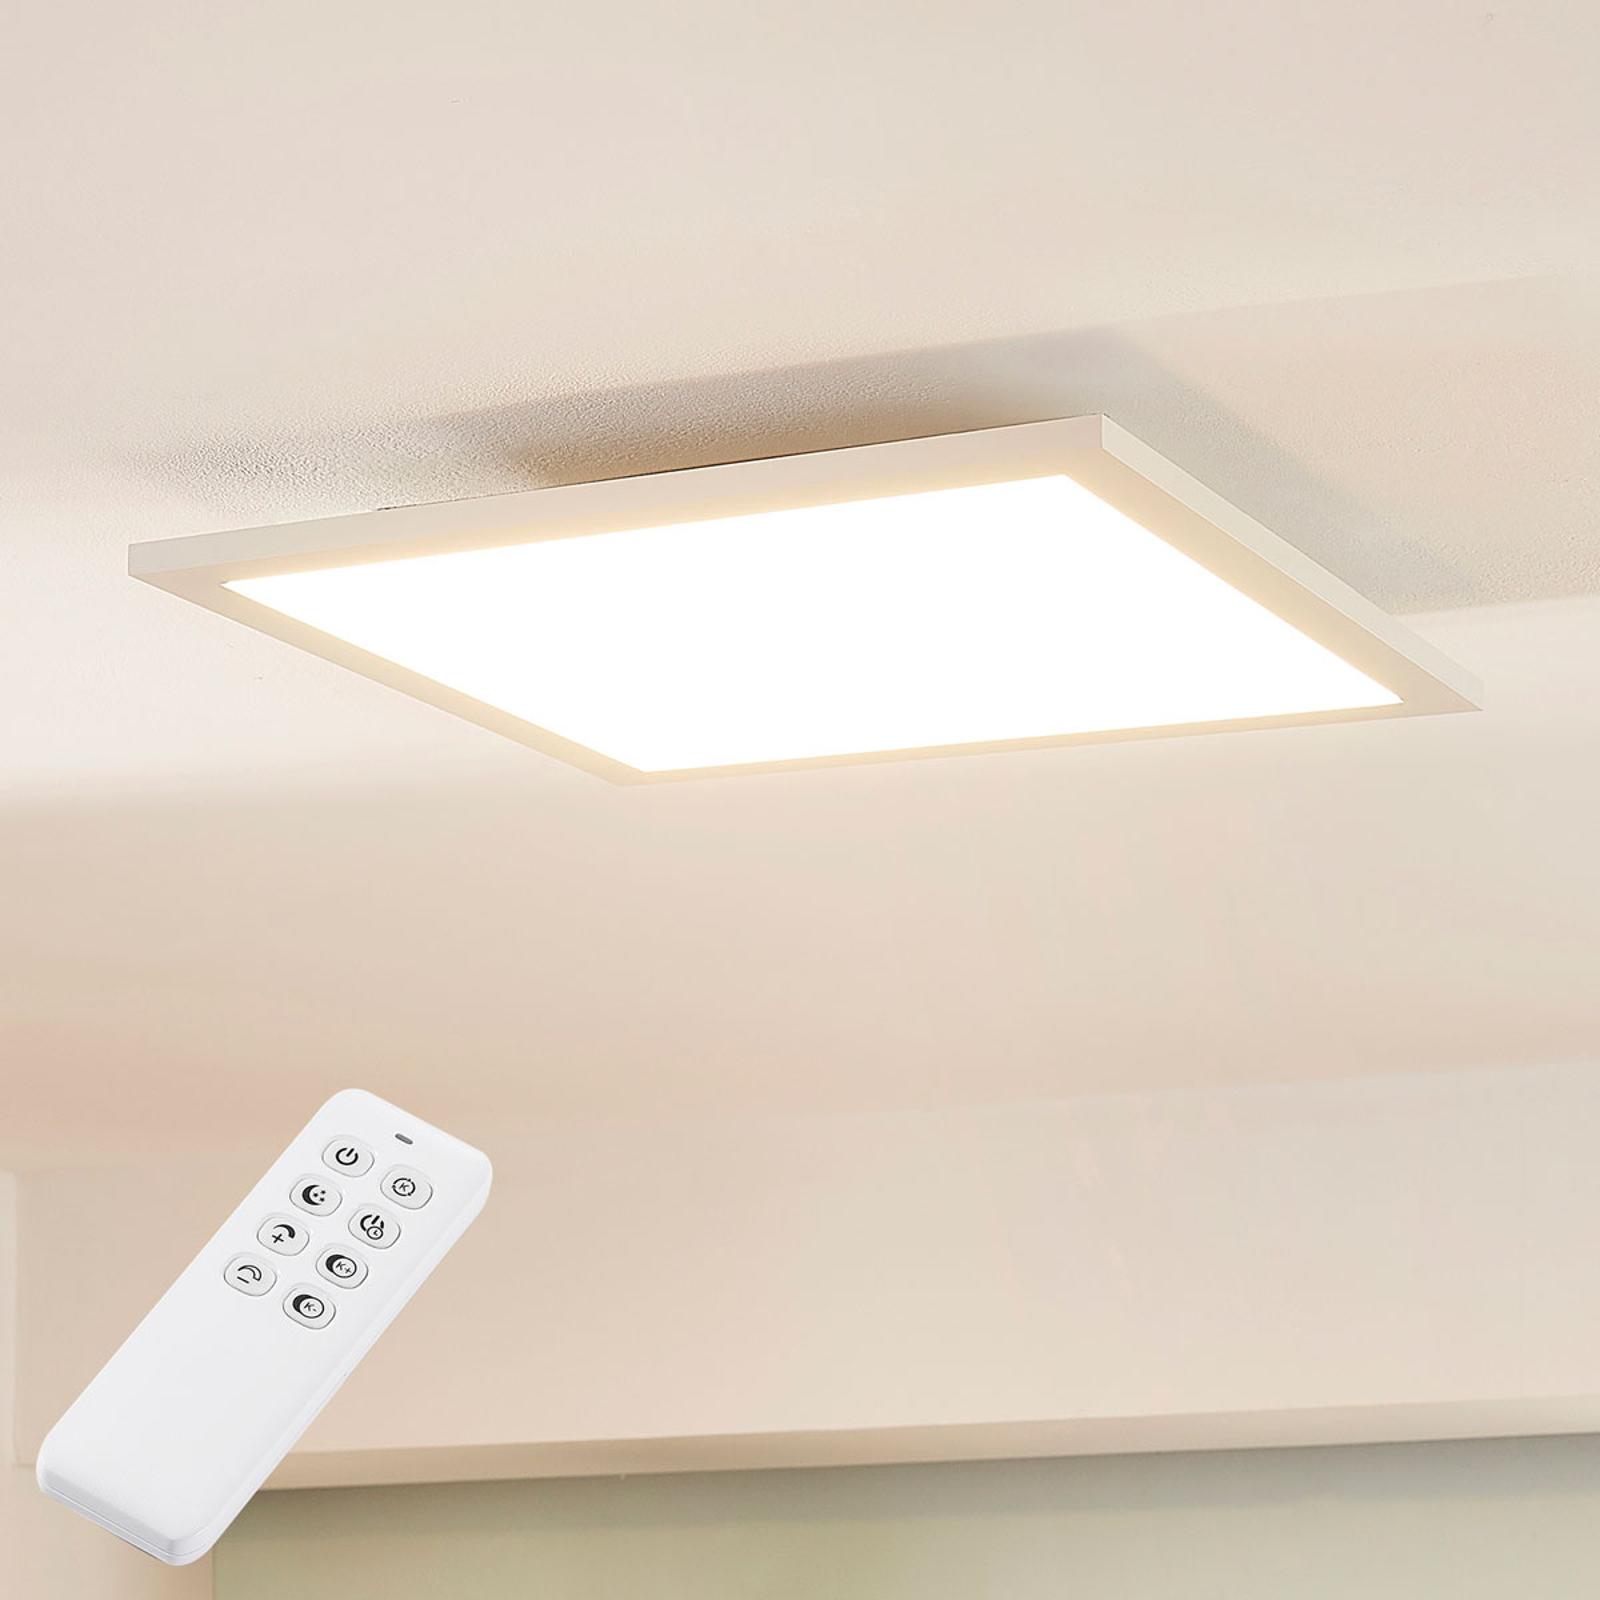 Dimmbare LED-Deckenlampe Lysander m. Fernbedienung